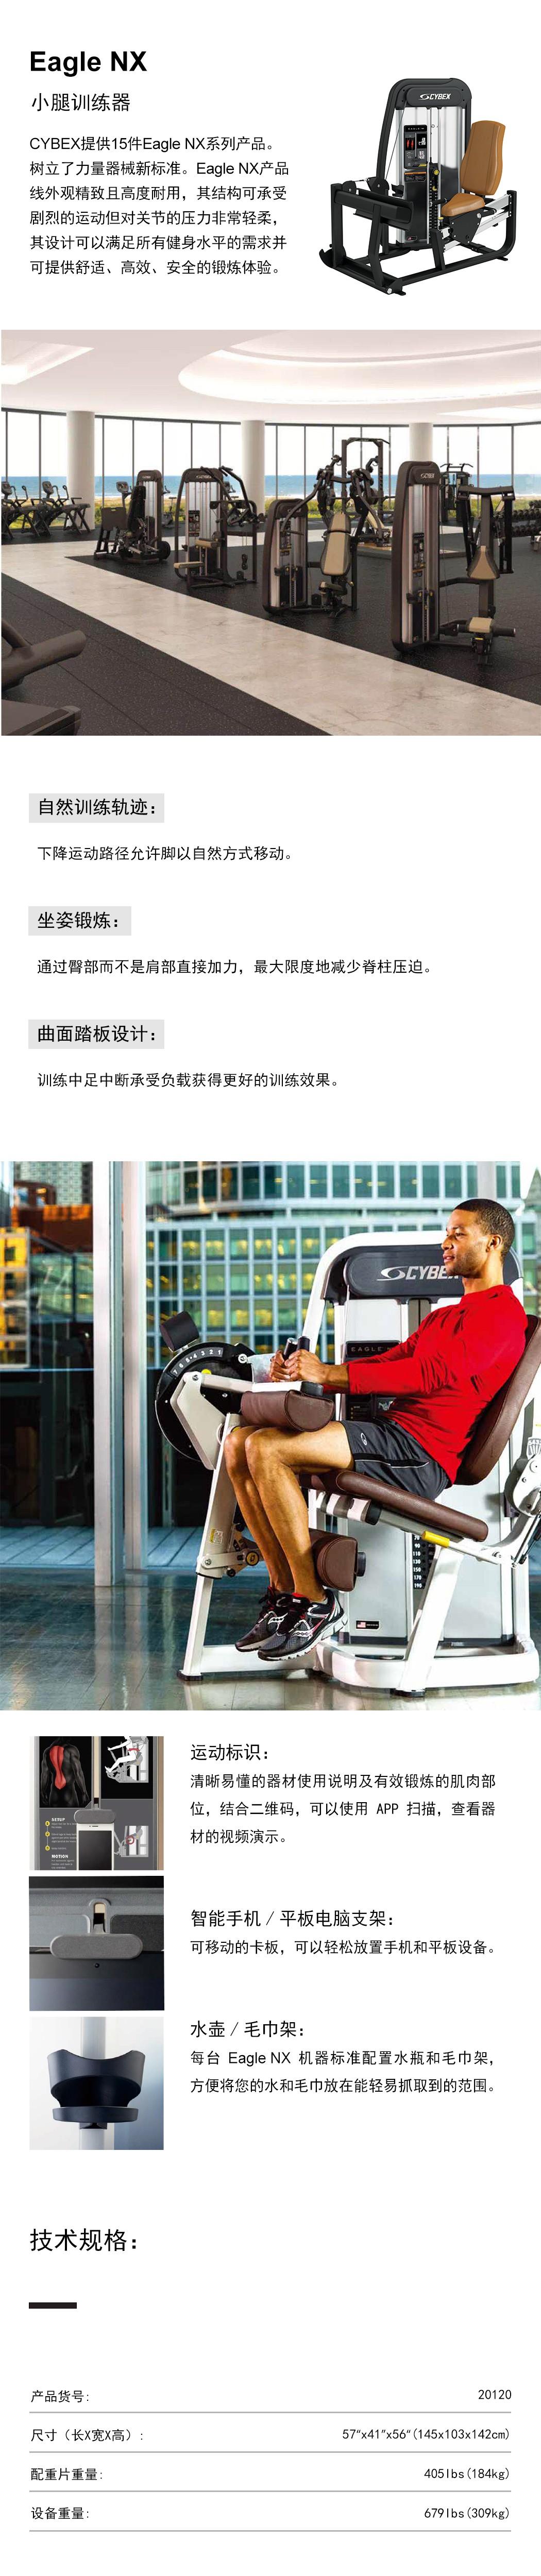 cybex-小腿训练器.jpg